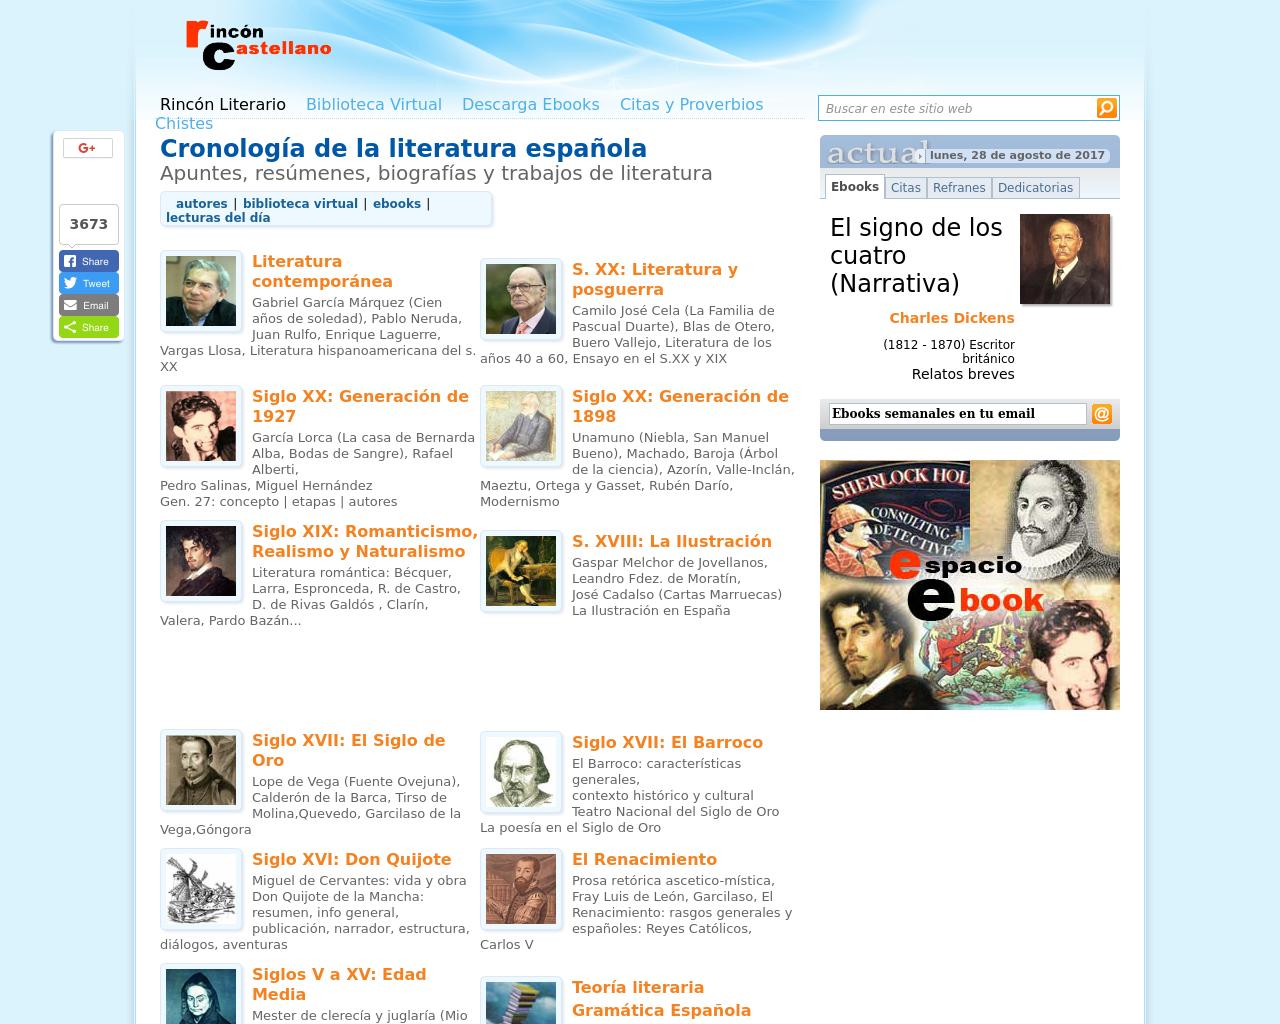 Rincon-Castellano-Advertising-Reviews-Pricing